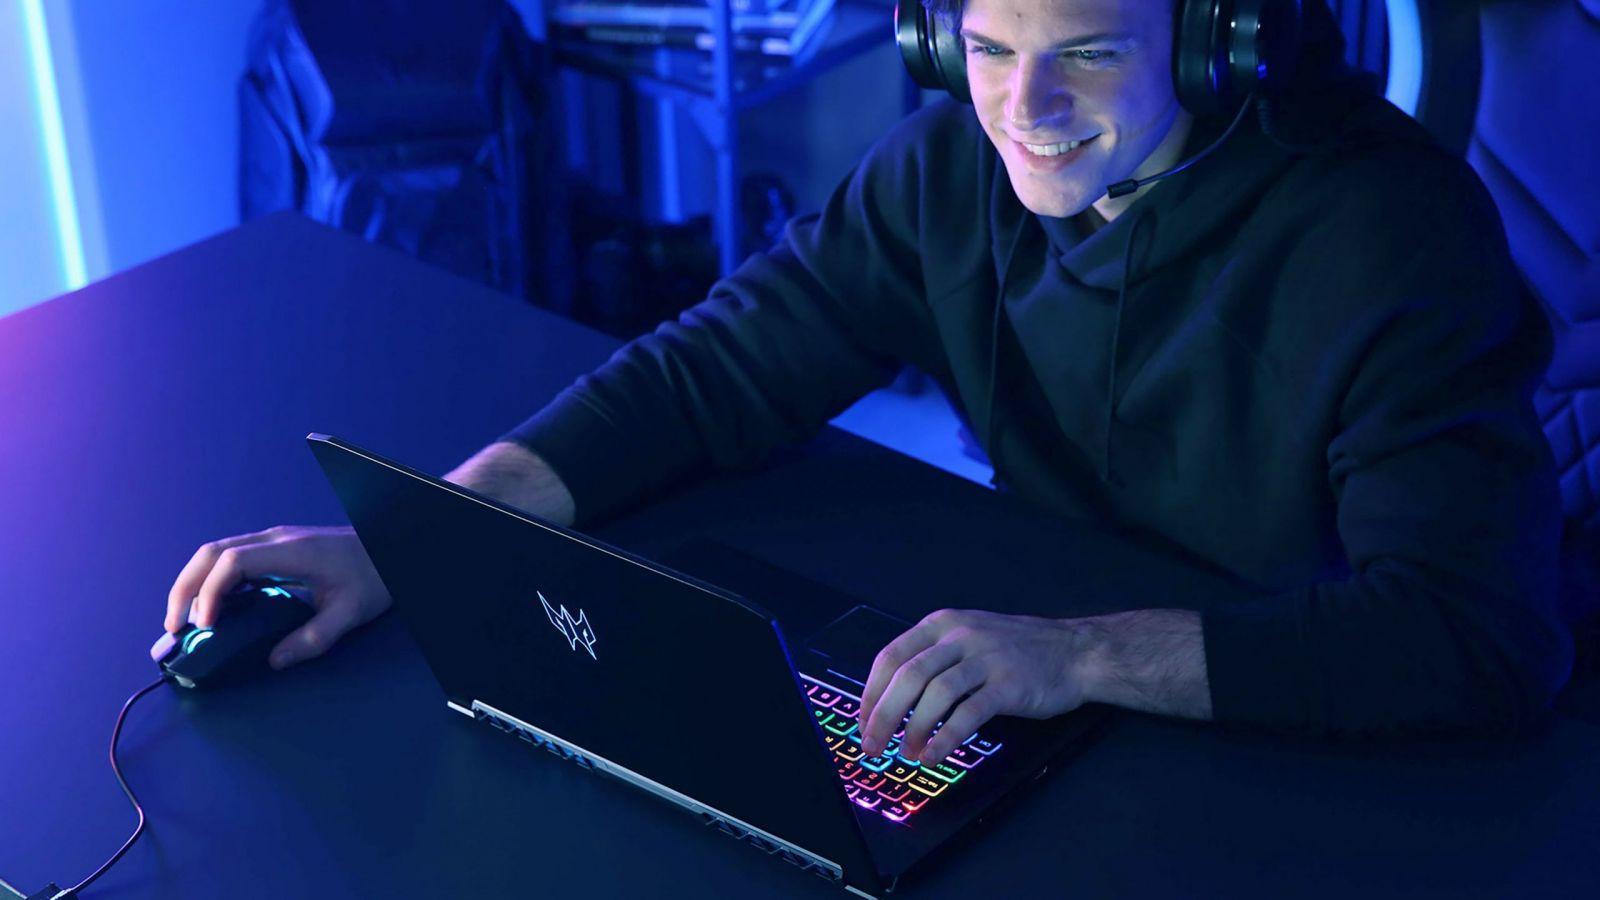 Acer представил обновлённые игровые ноутбуки Predator Triton 500 и Acer Nitro 5 (w c4ftsa scaled)